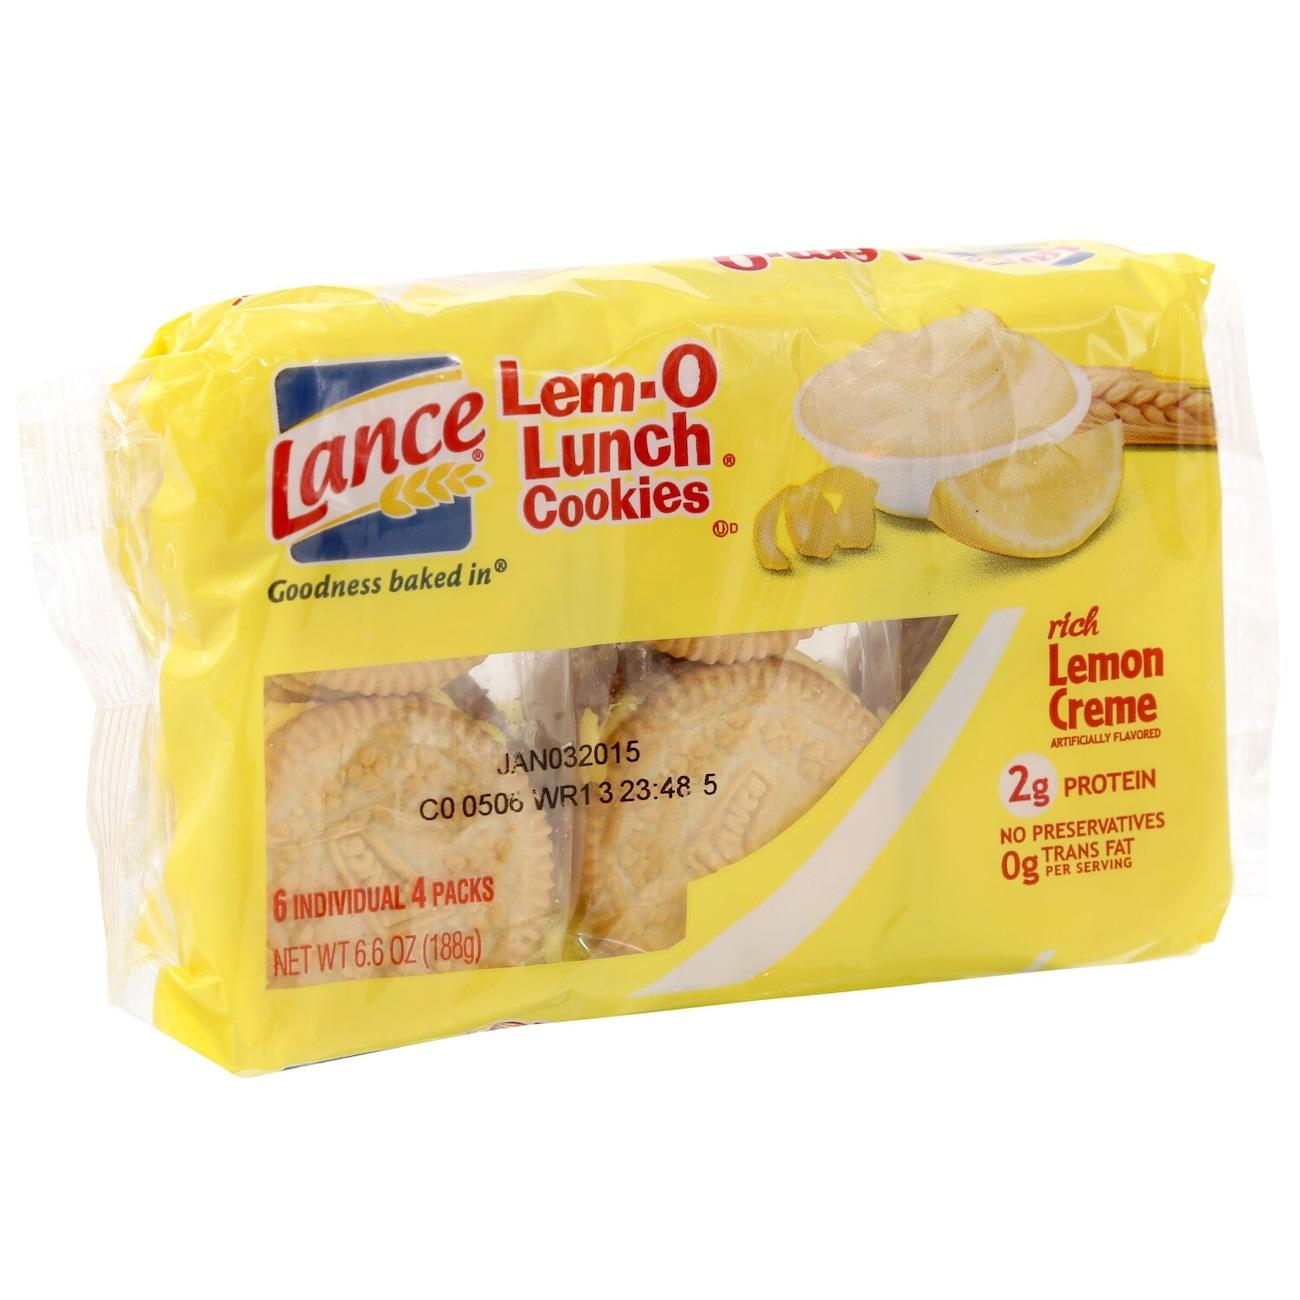 Lemon Cookies - Dollar Tree, Inc.